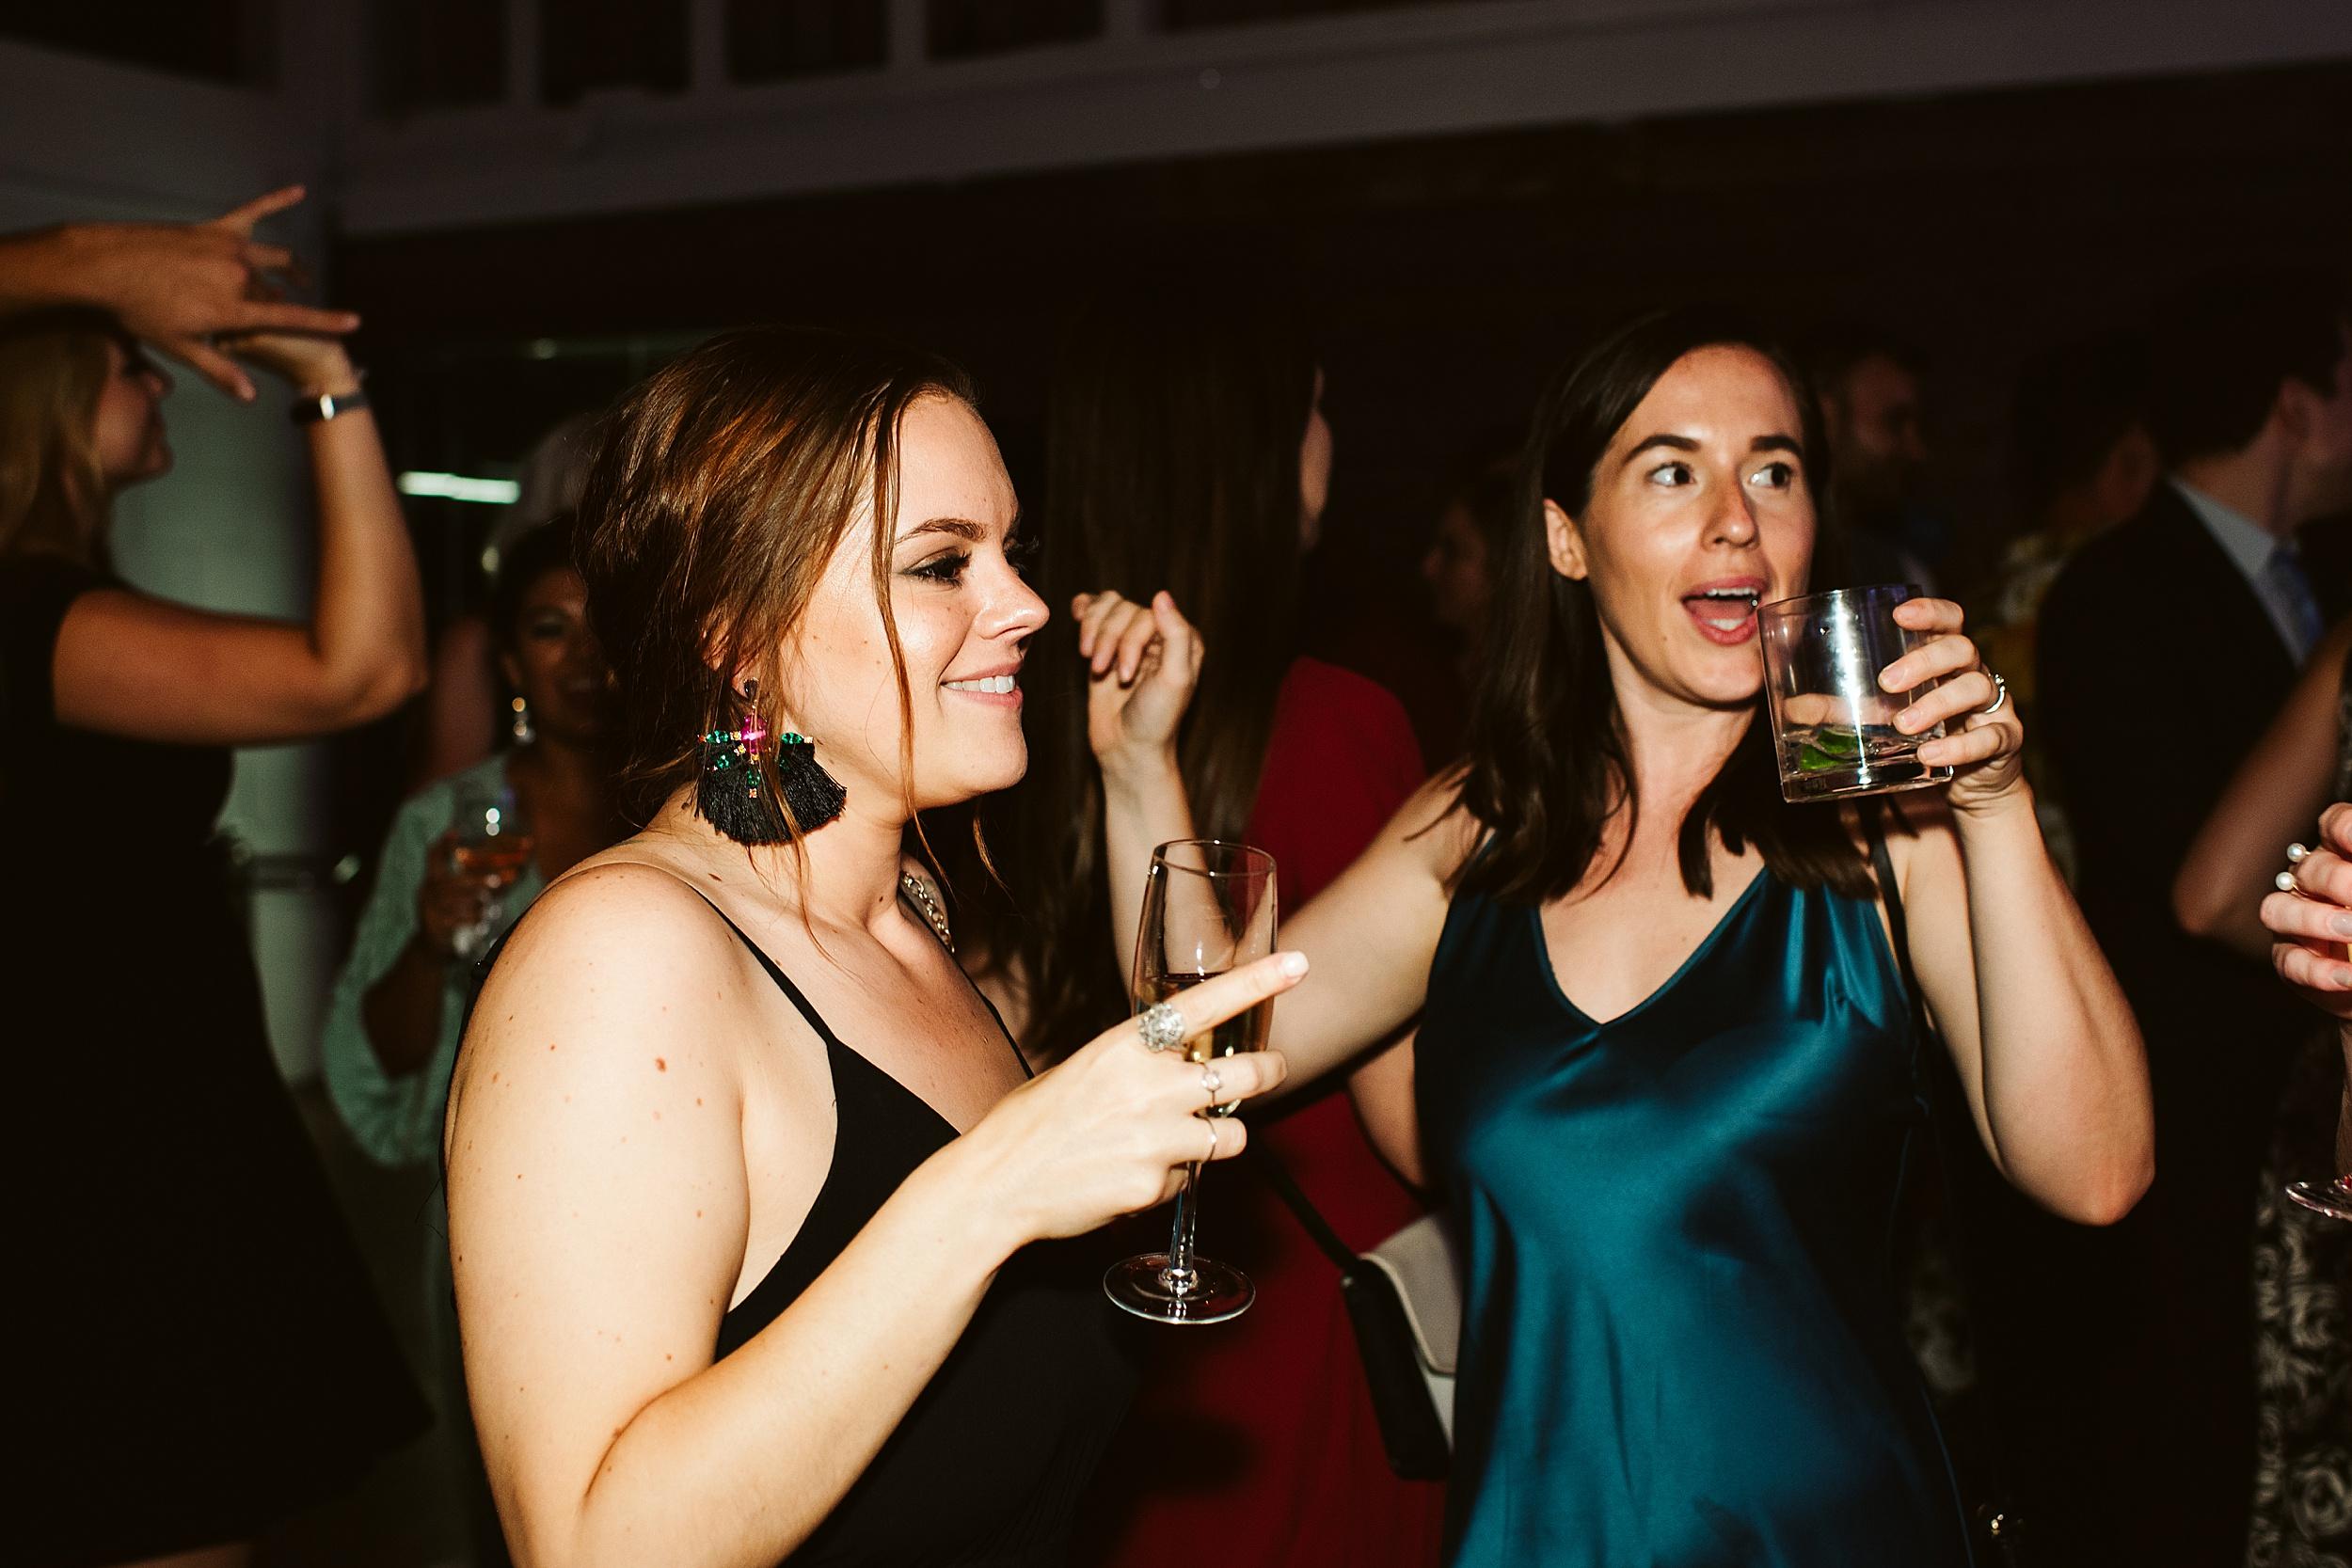 Airship-37-Berkeley-Events-Distillery-District-Wedding-Toronto-Wedding-Photographers_0098.jpg